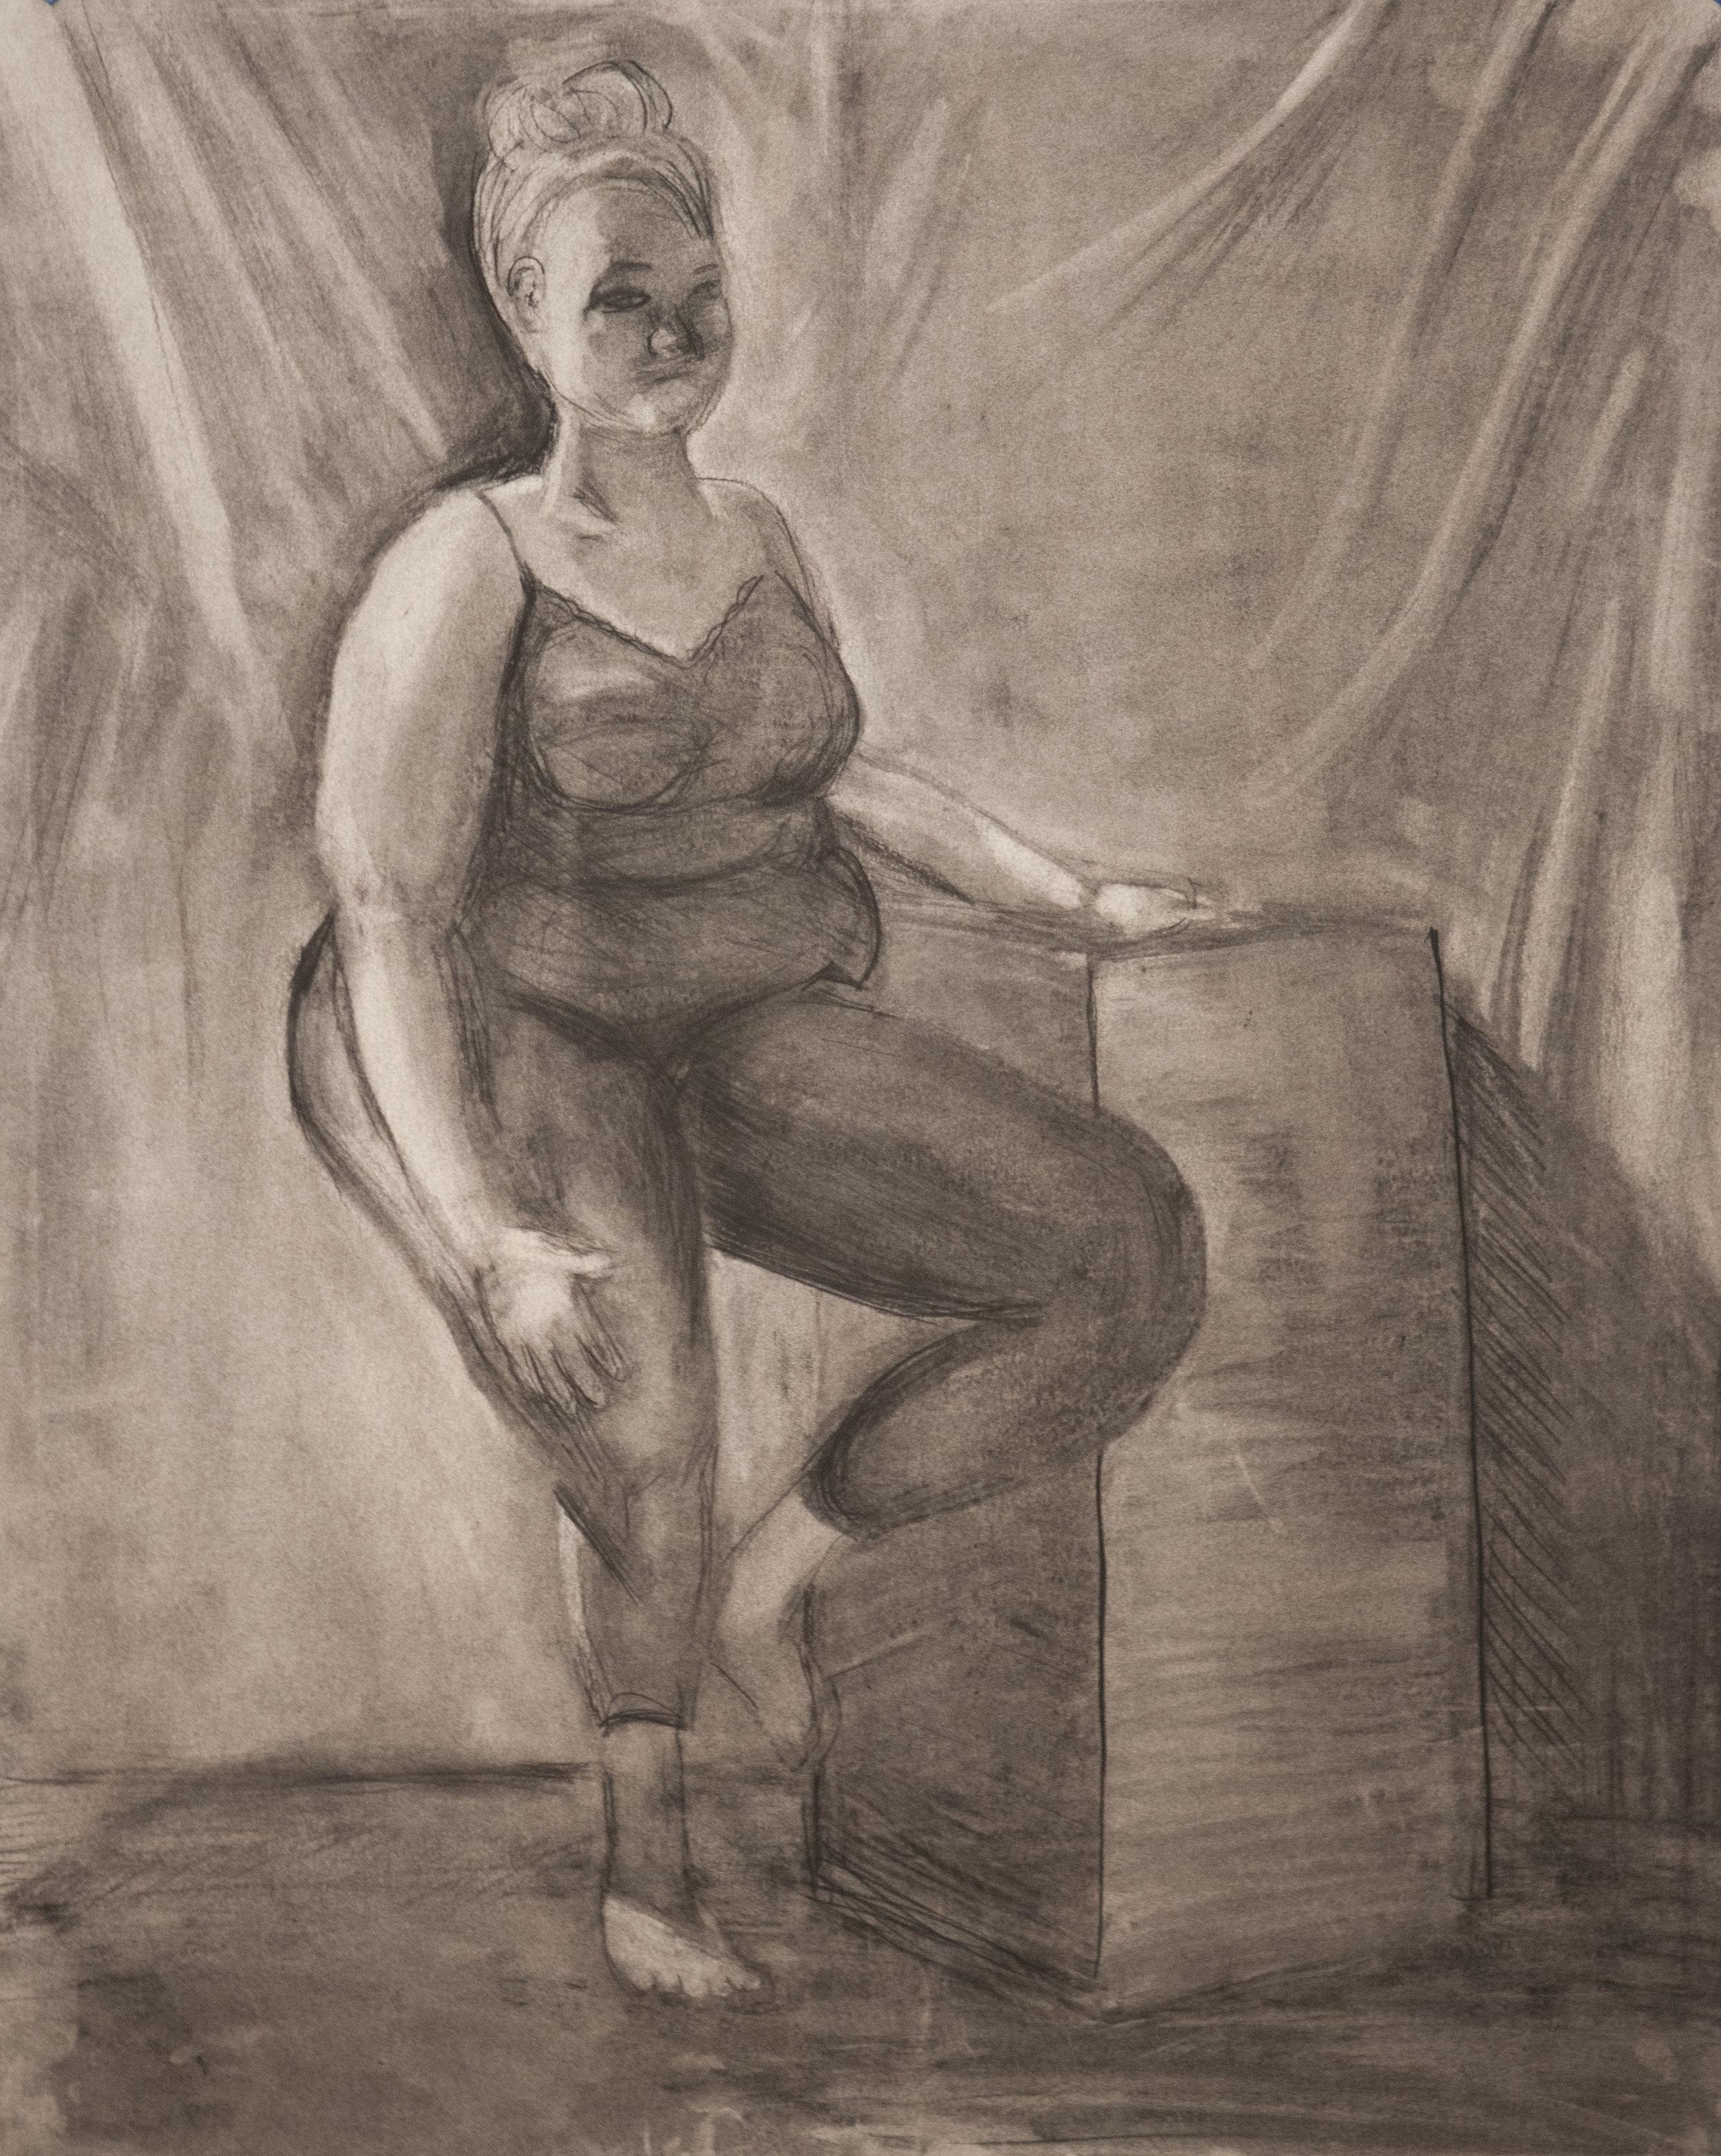 Full Sized Figure